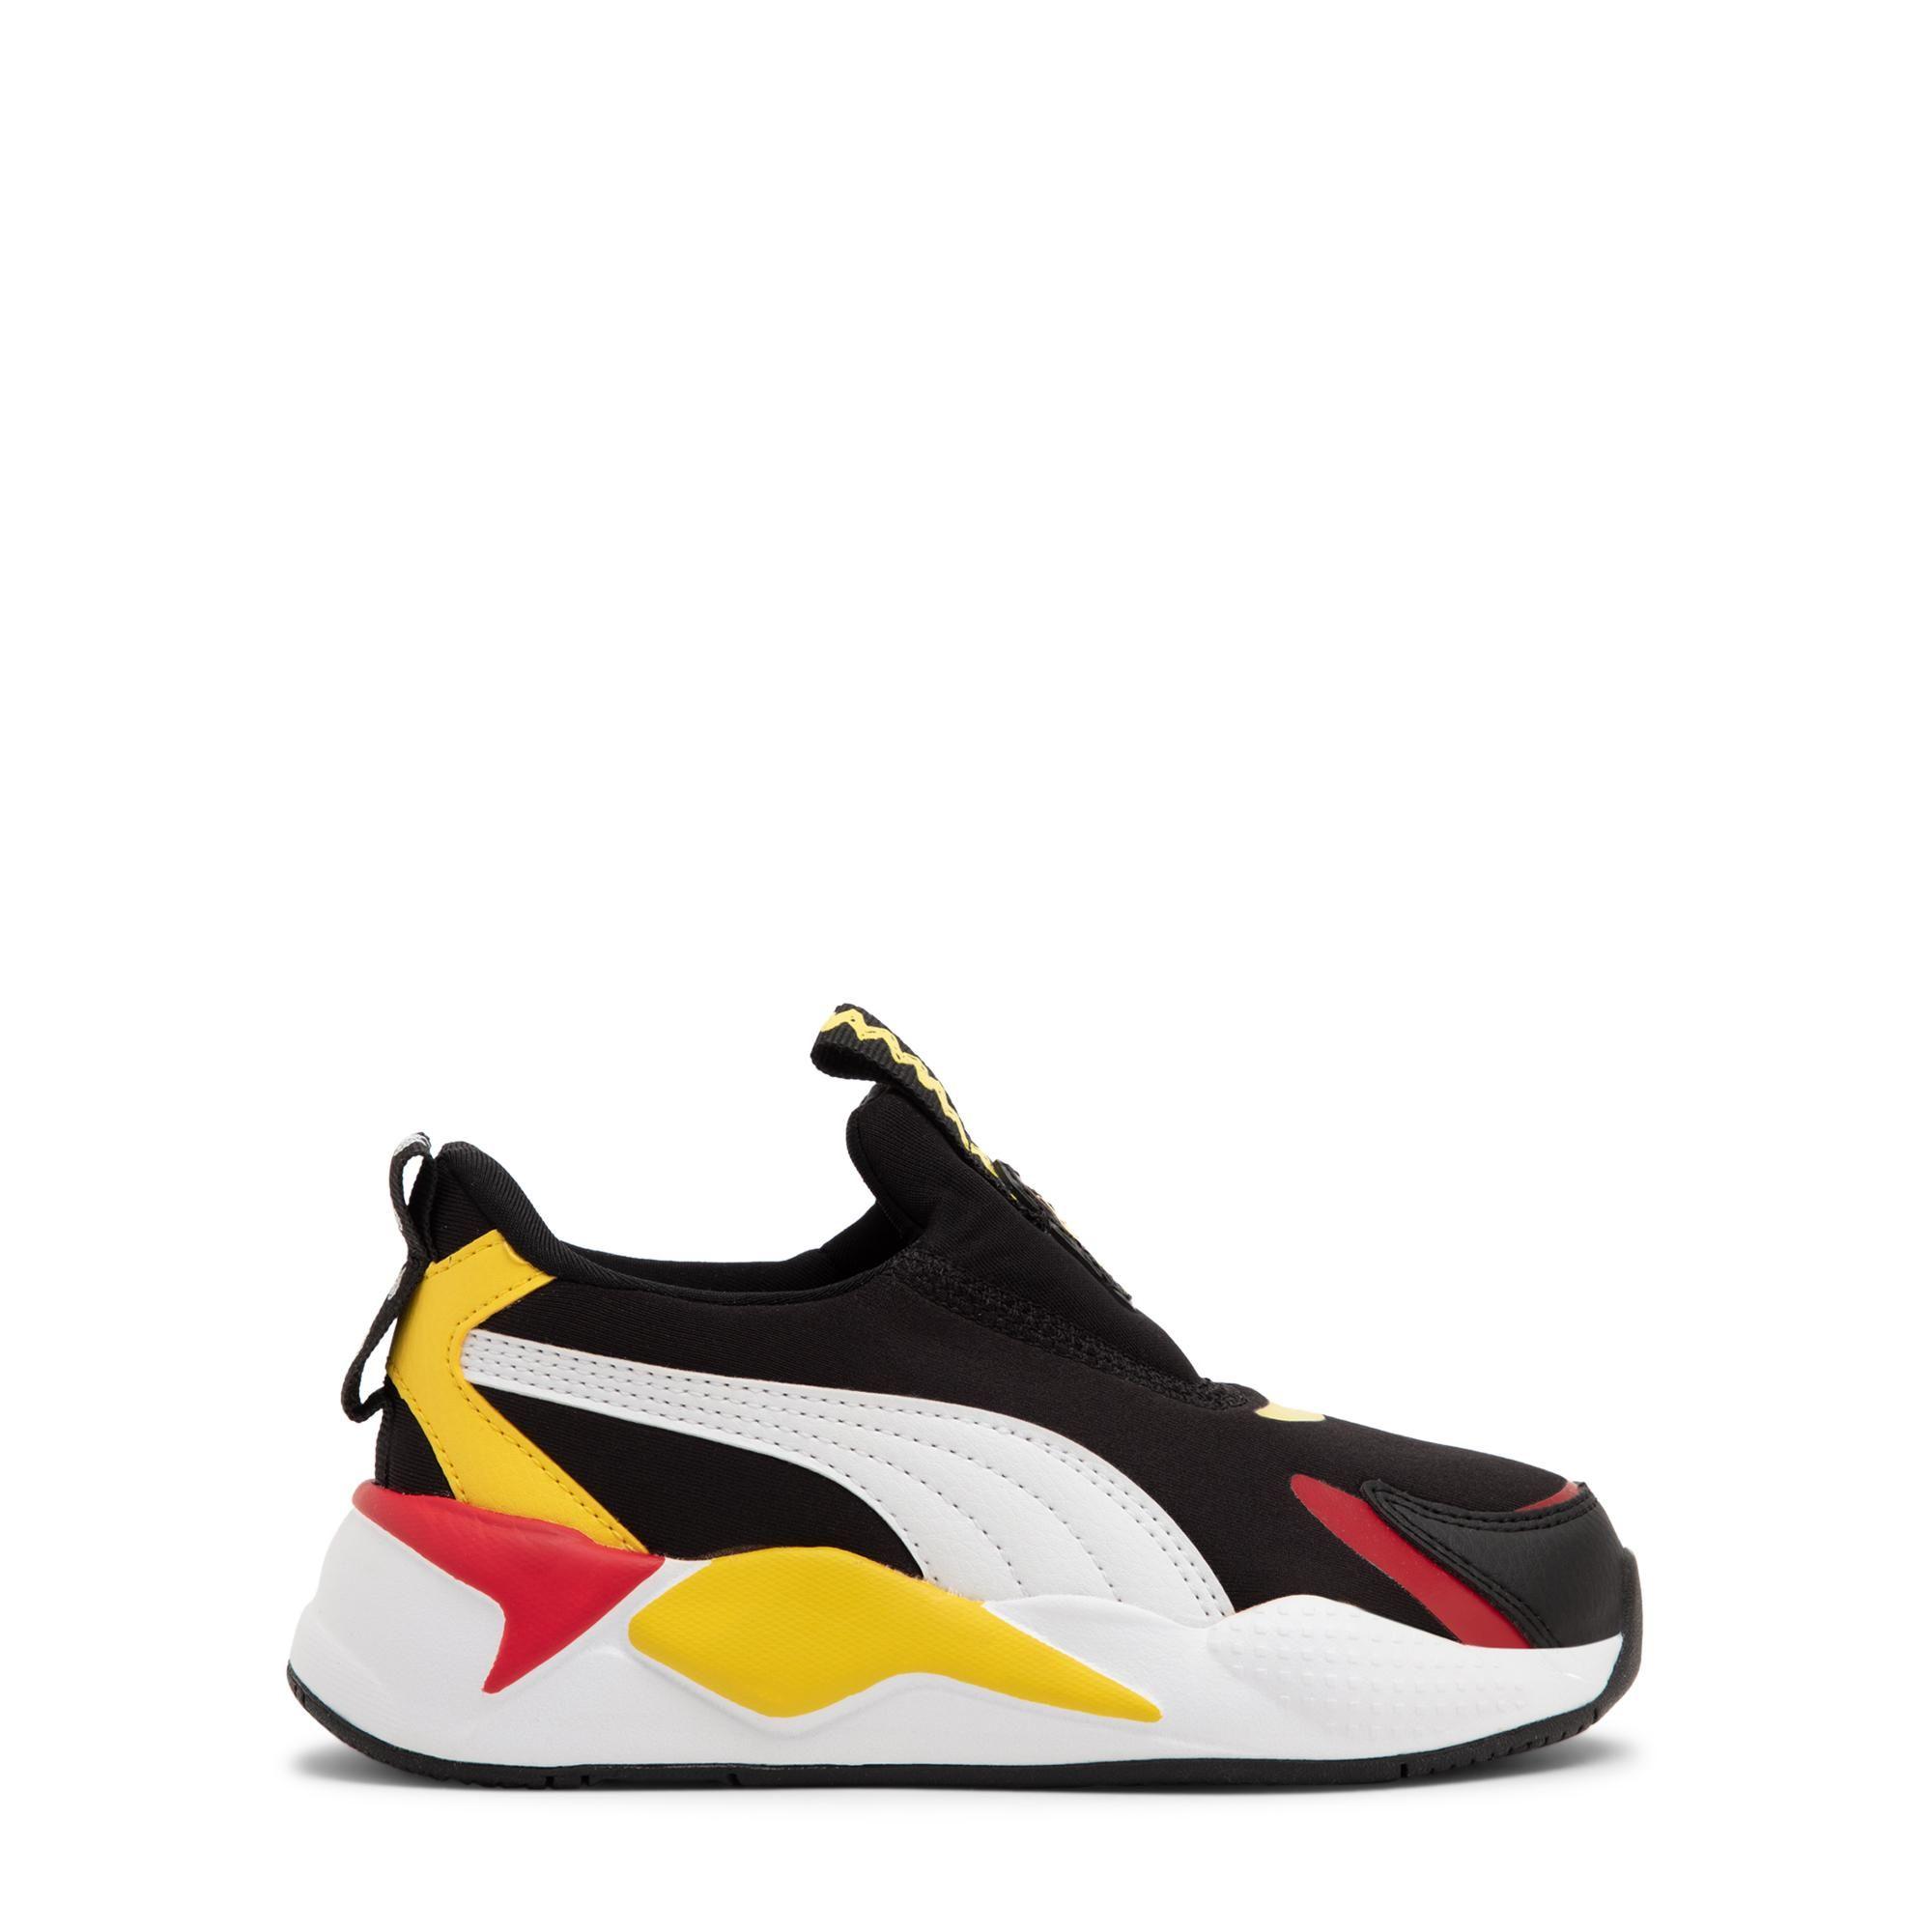 PEANUTS RS-X³ slip-on sneakers